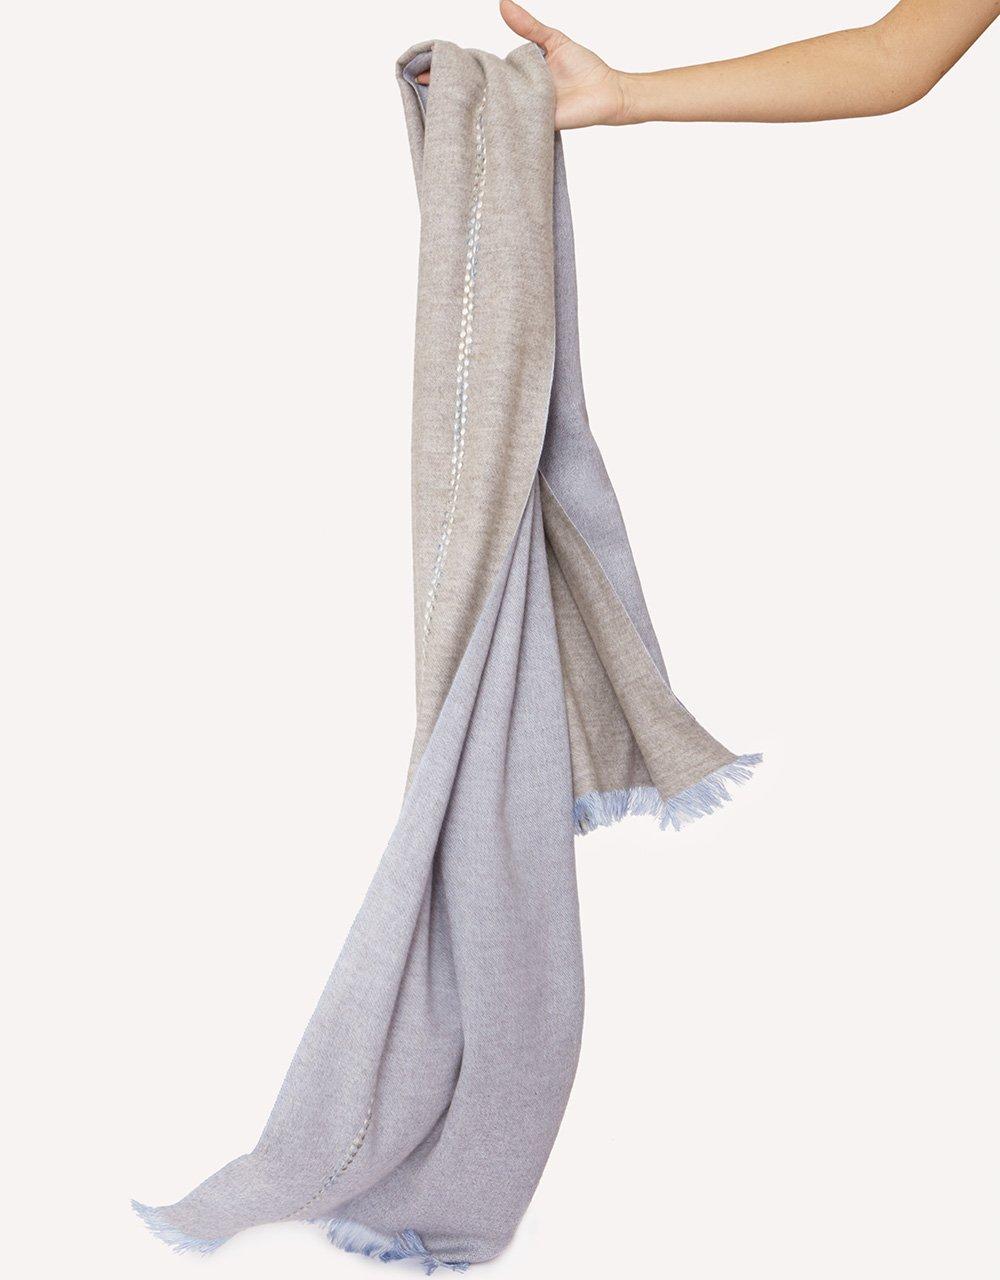 foulard05e